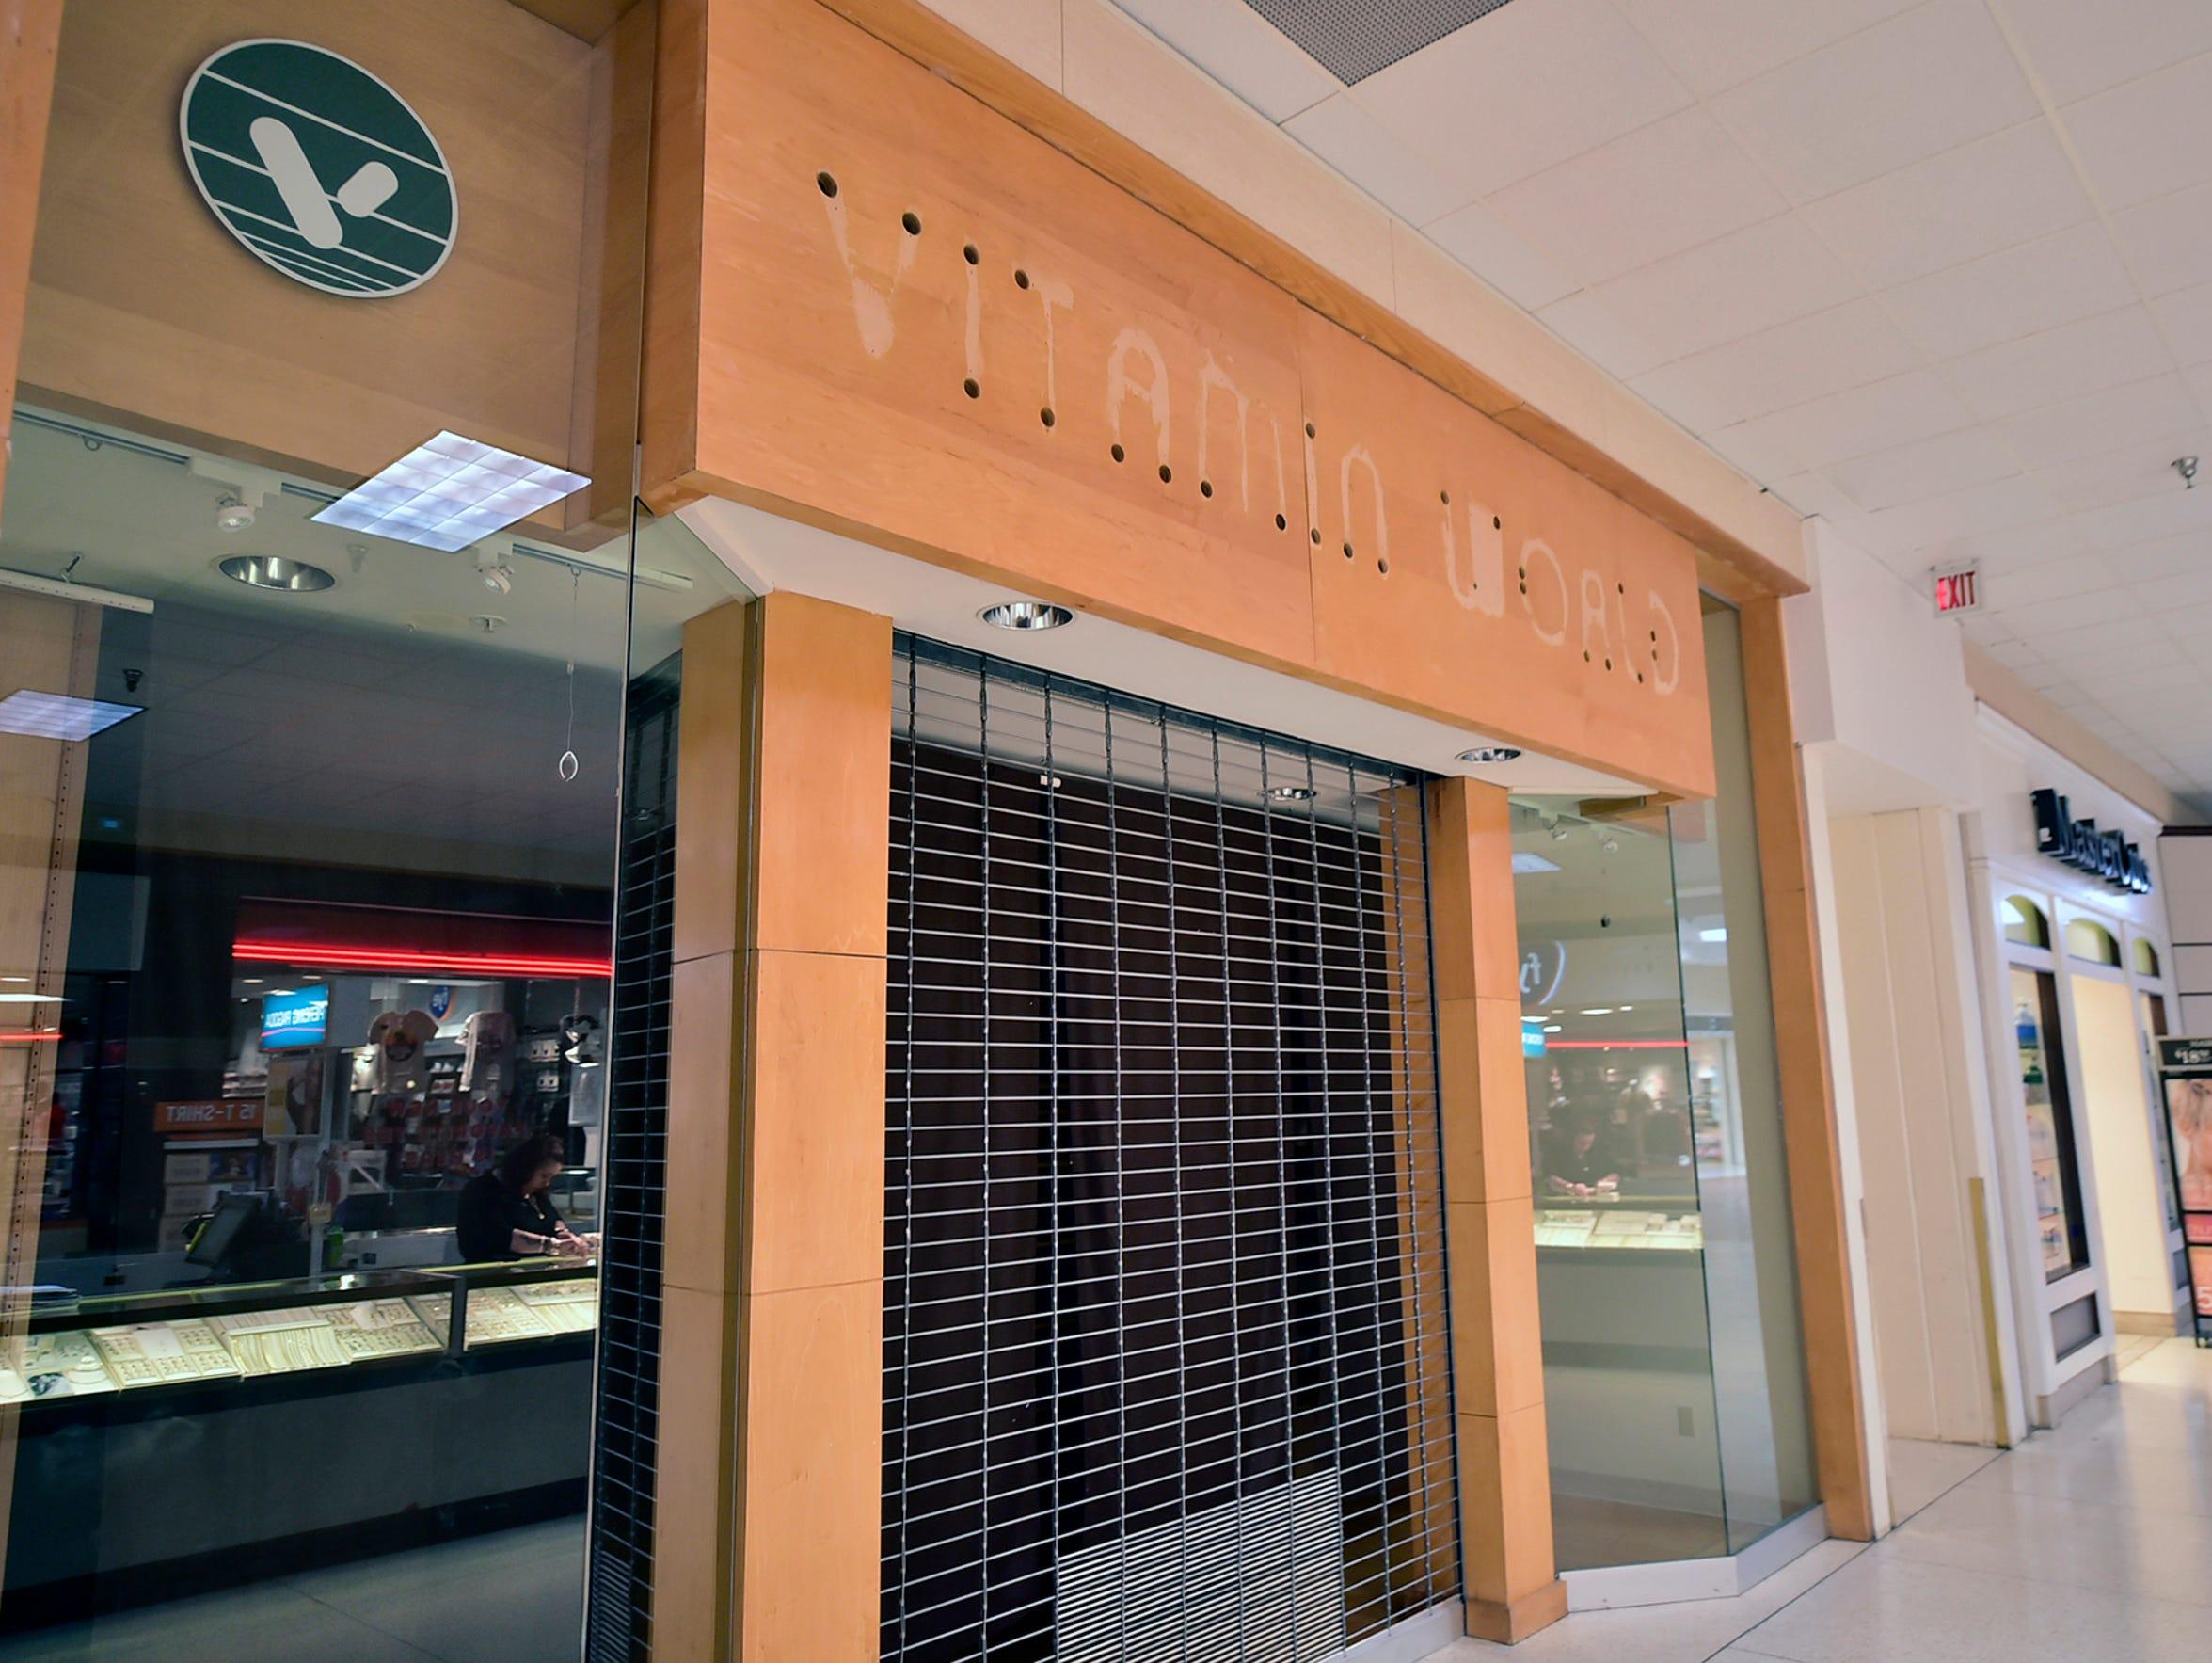 Vitamin World is no longer at Chambersburg Mall. Bon-Ton